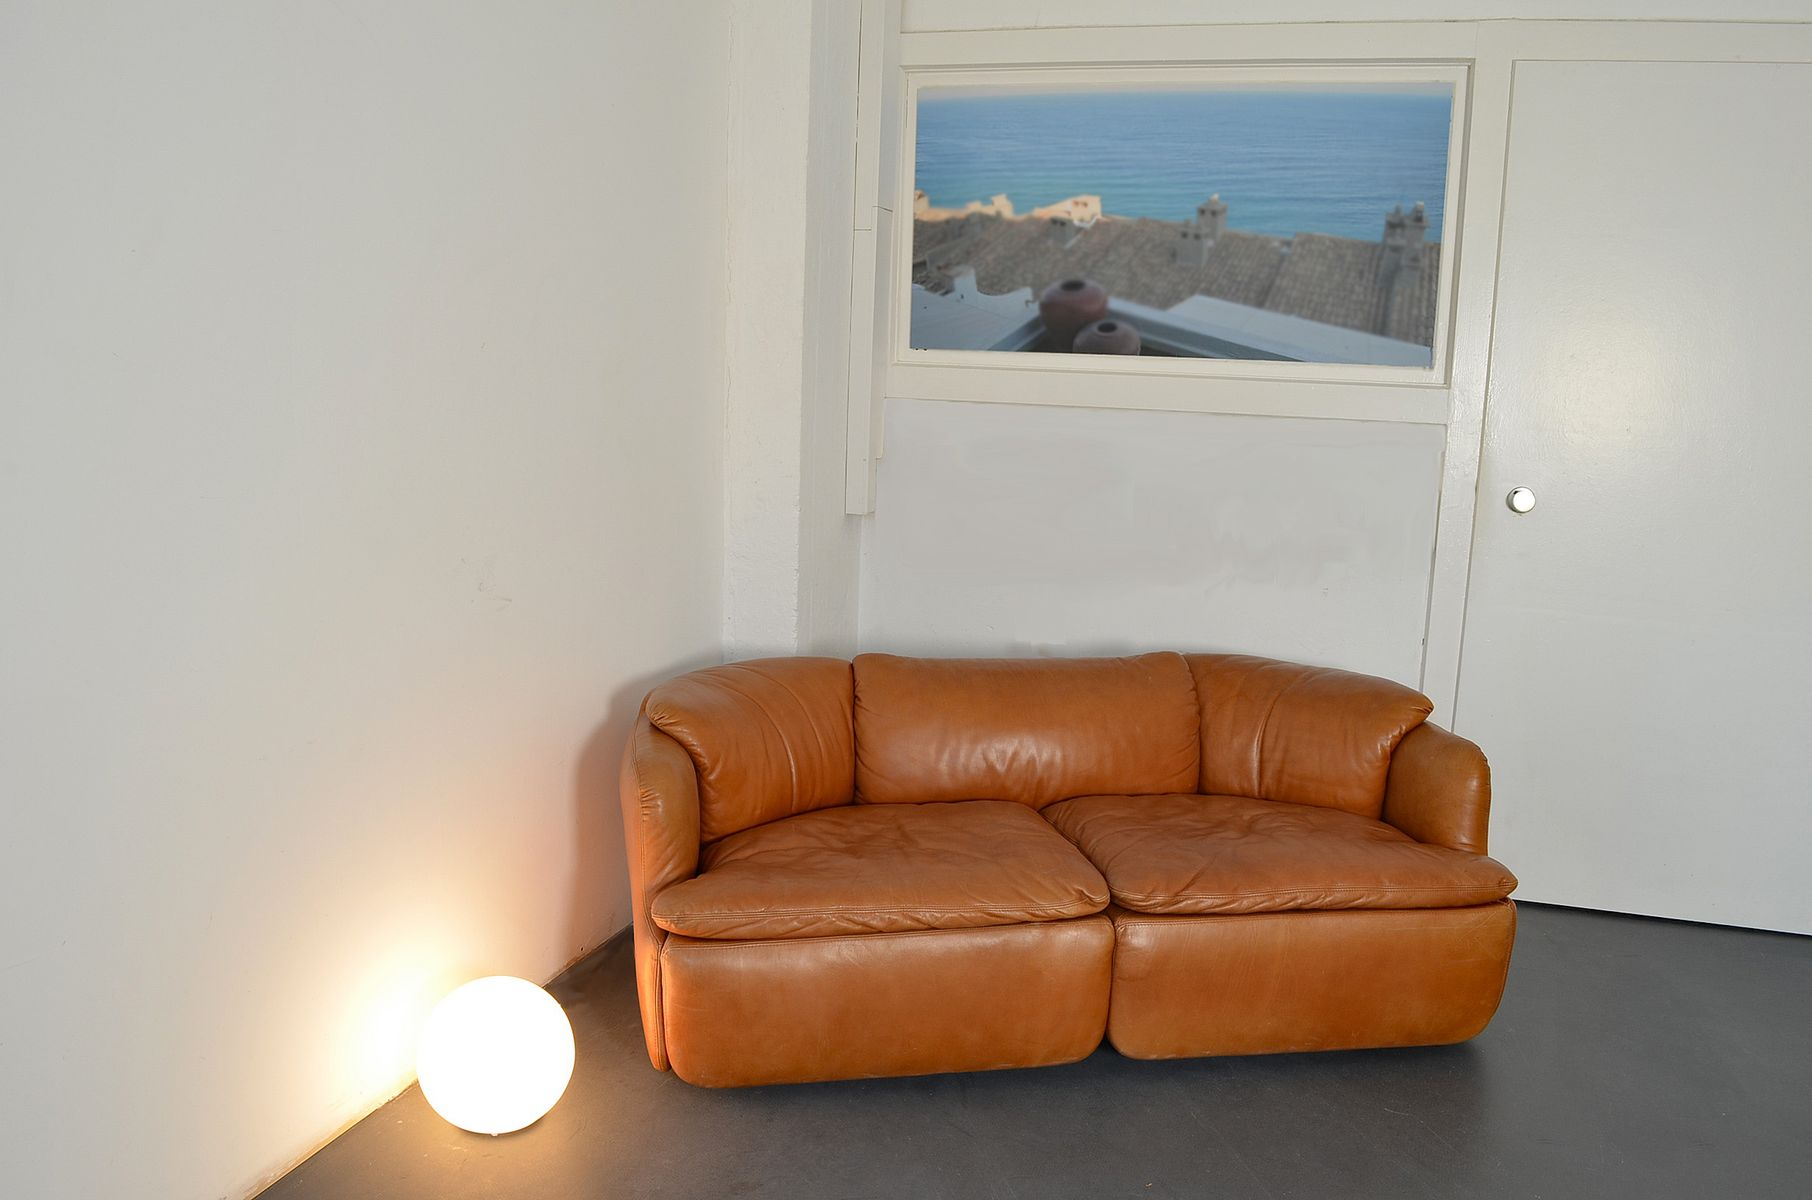 confidential zwei sitzer sofa von alberto roselli f r saporiti italia 1970er bei pamono kaufen. Black Bedroom Furniture Sets. Home Design Ideas